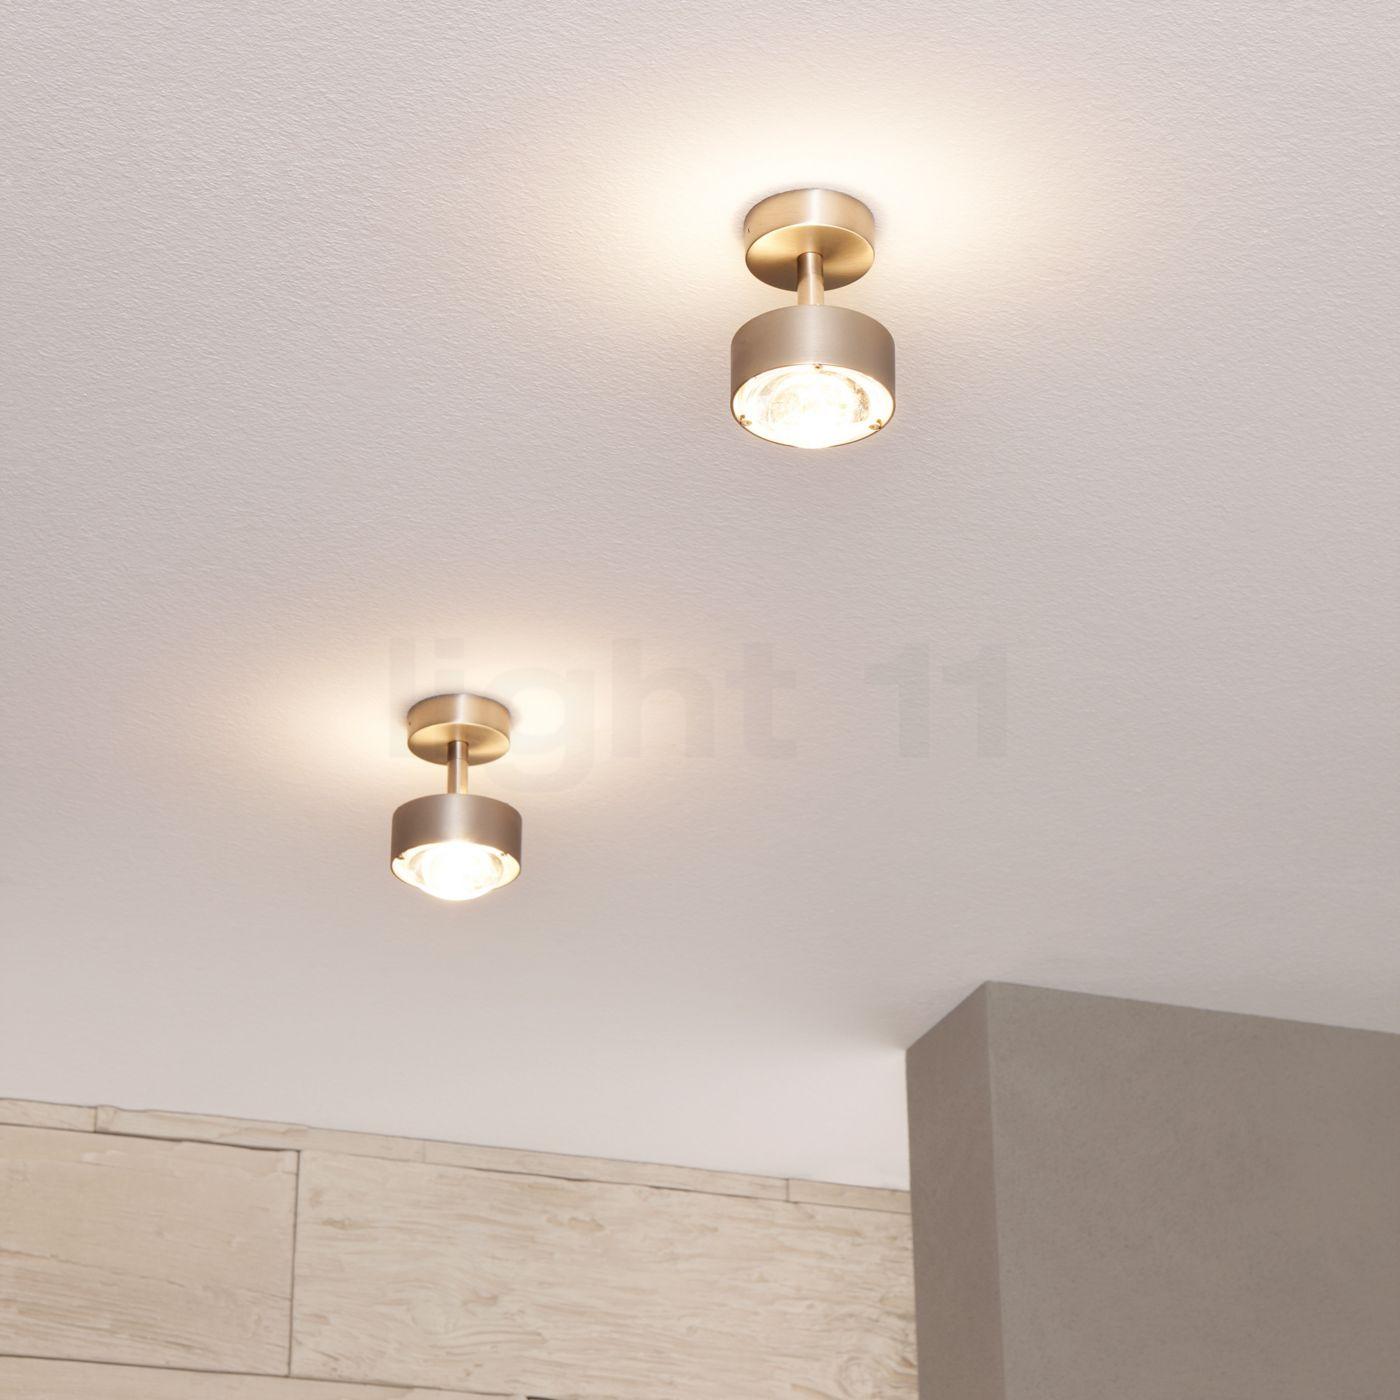 Toplight Puk top light puk turn up downlight led surface mounted ceiling lights